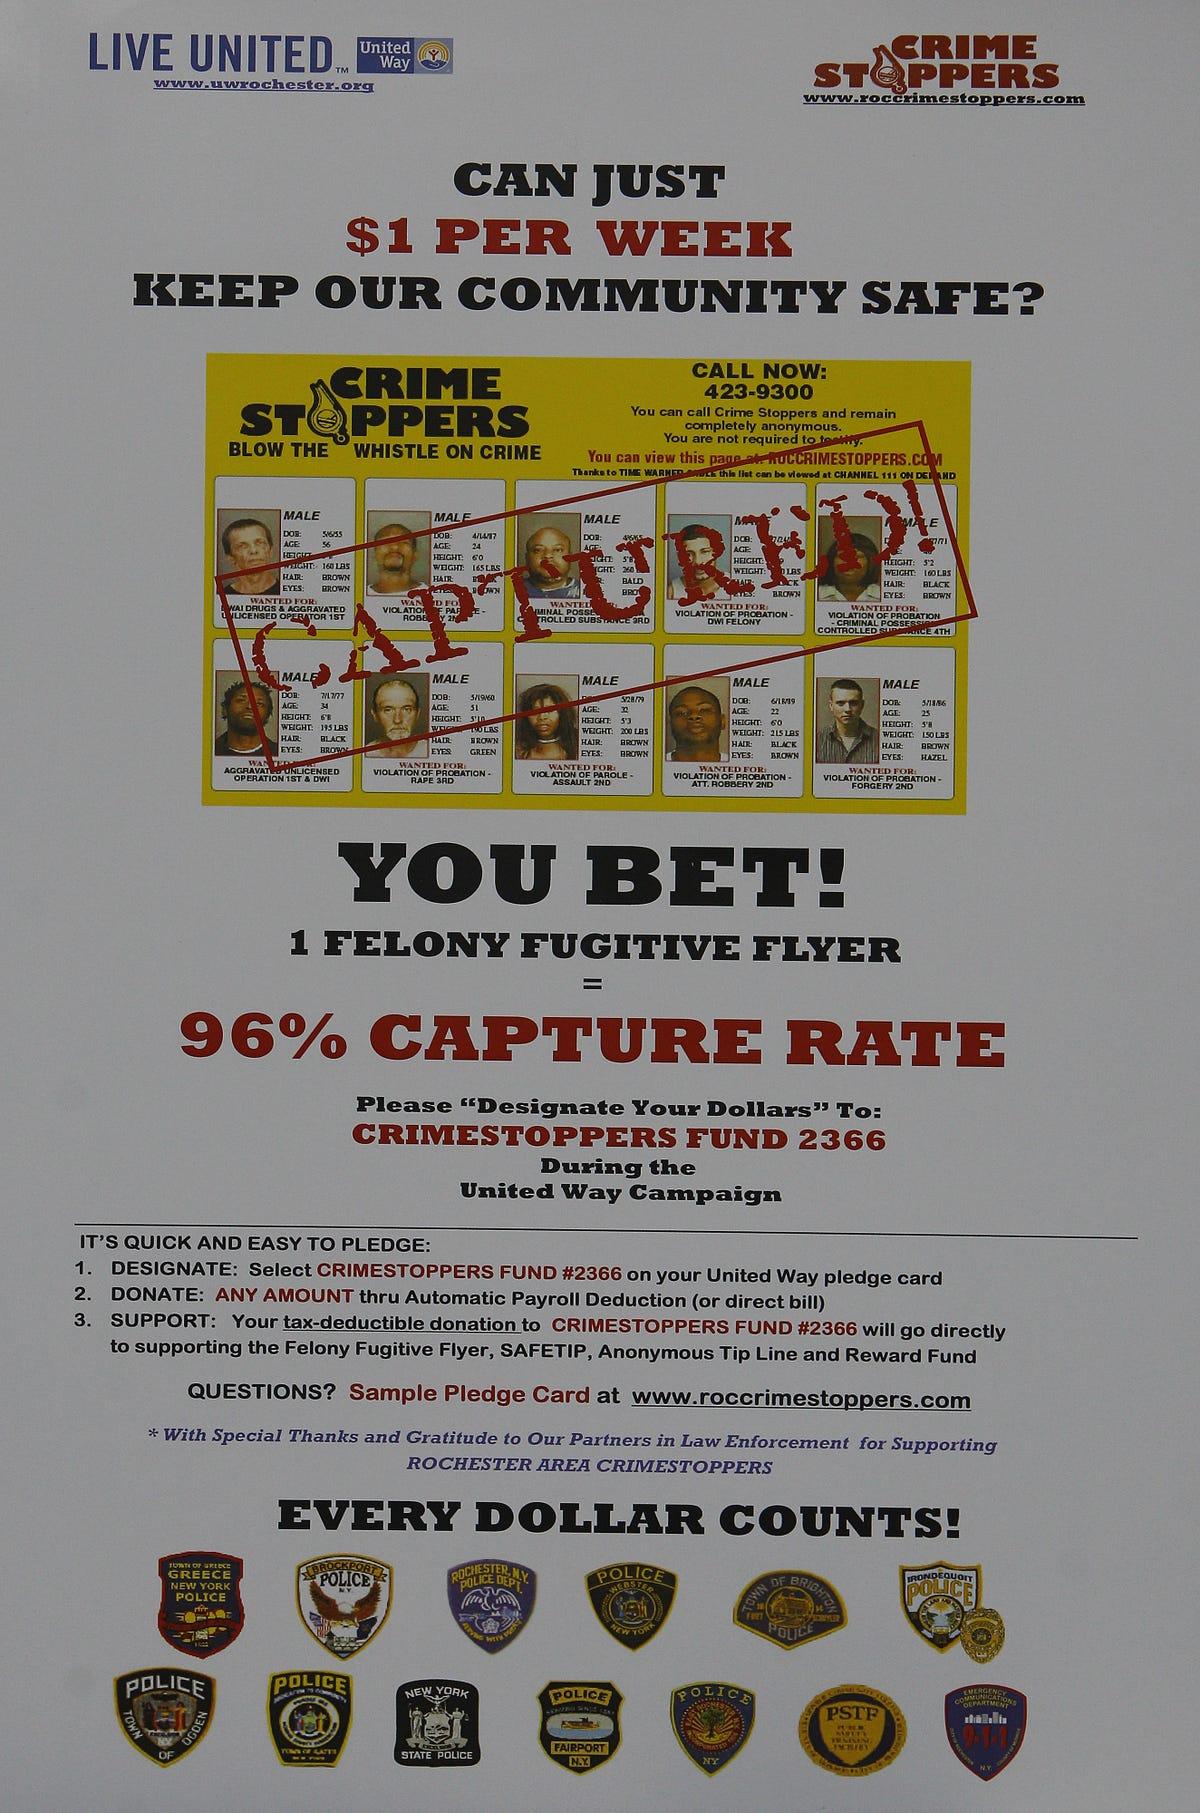 Crime Stopper tips on rise, helping solve crimes